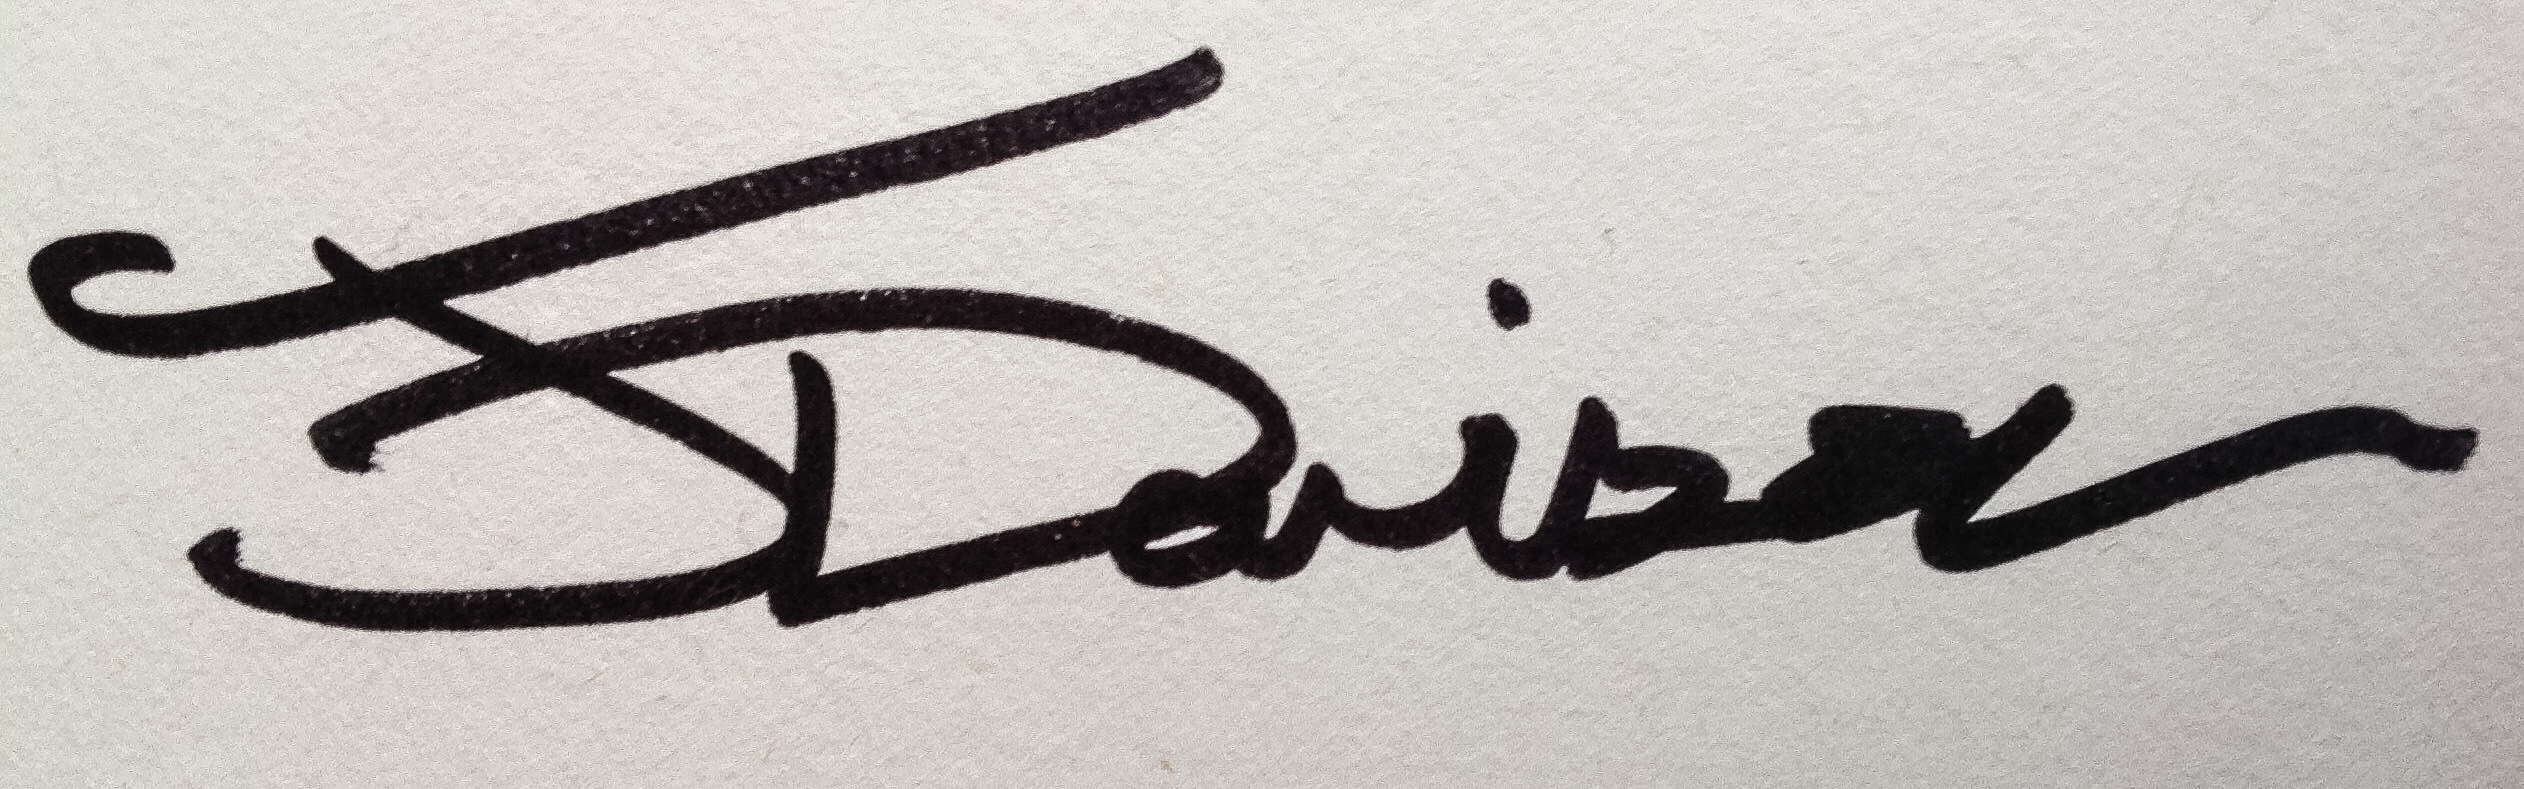 John Davison Signature